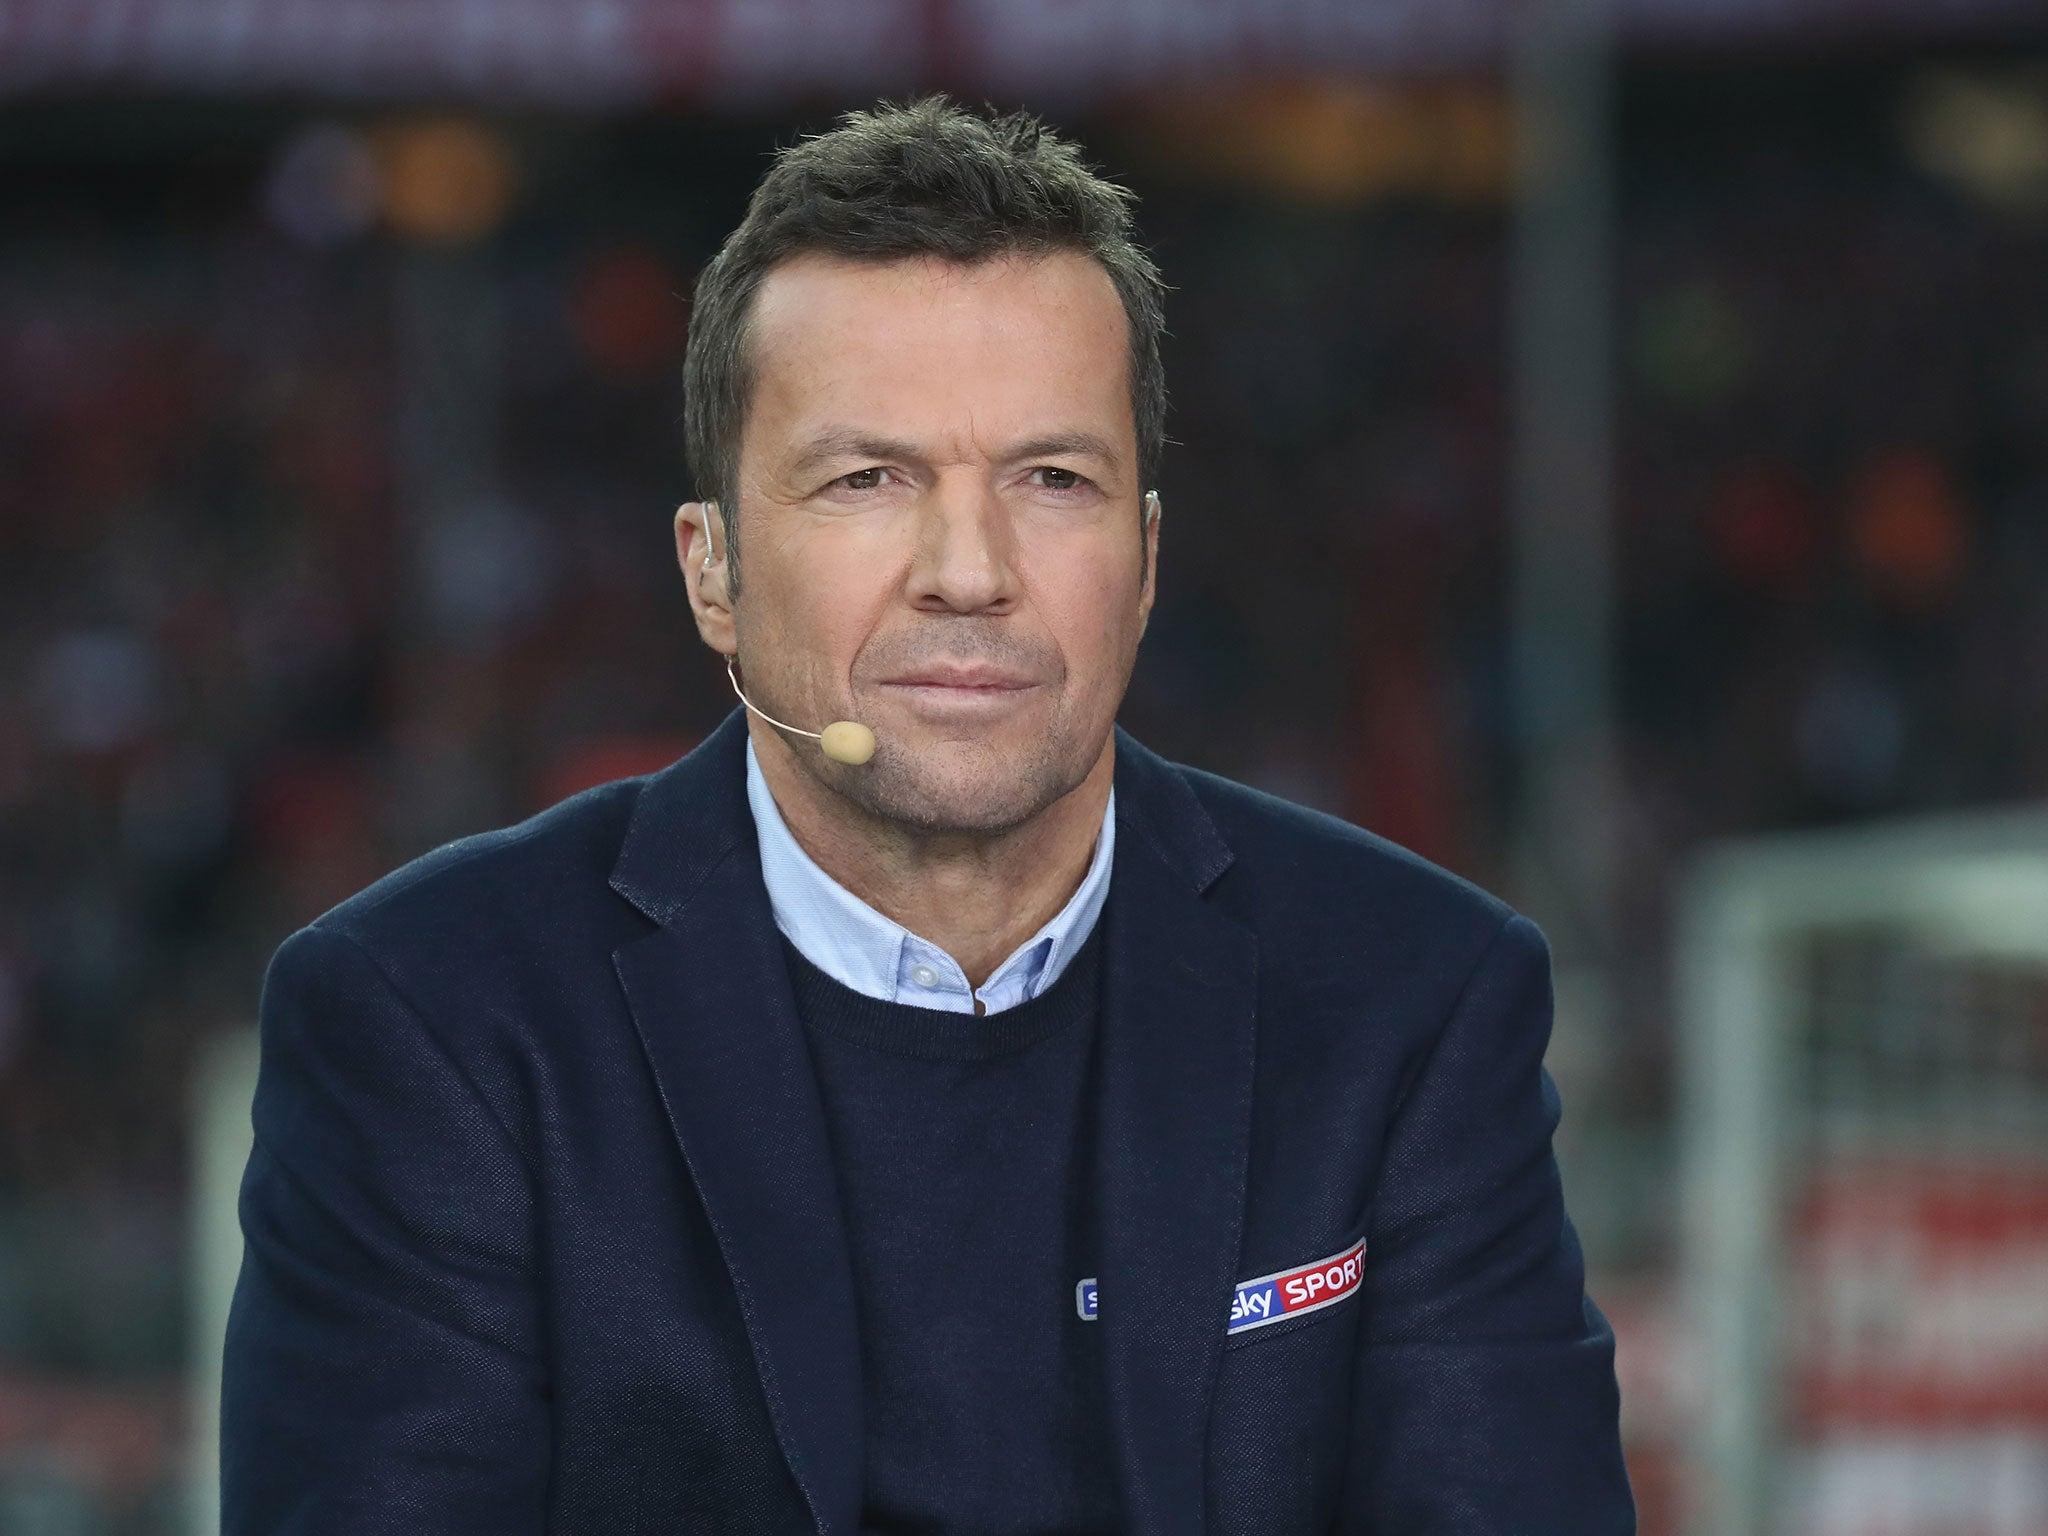 Lothar Matthaus sympathises with Borussia Dortmund over